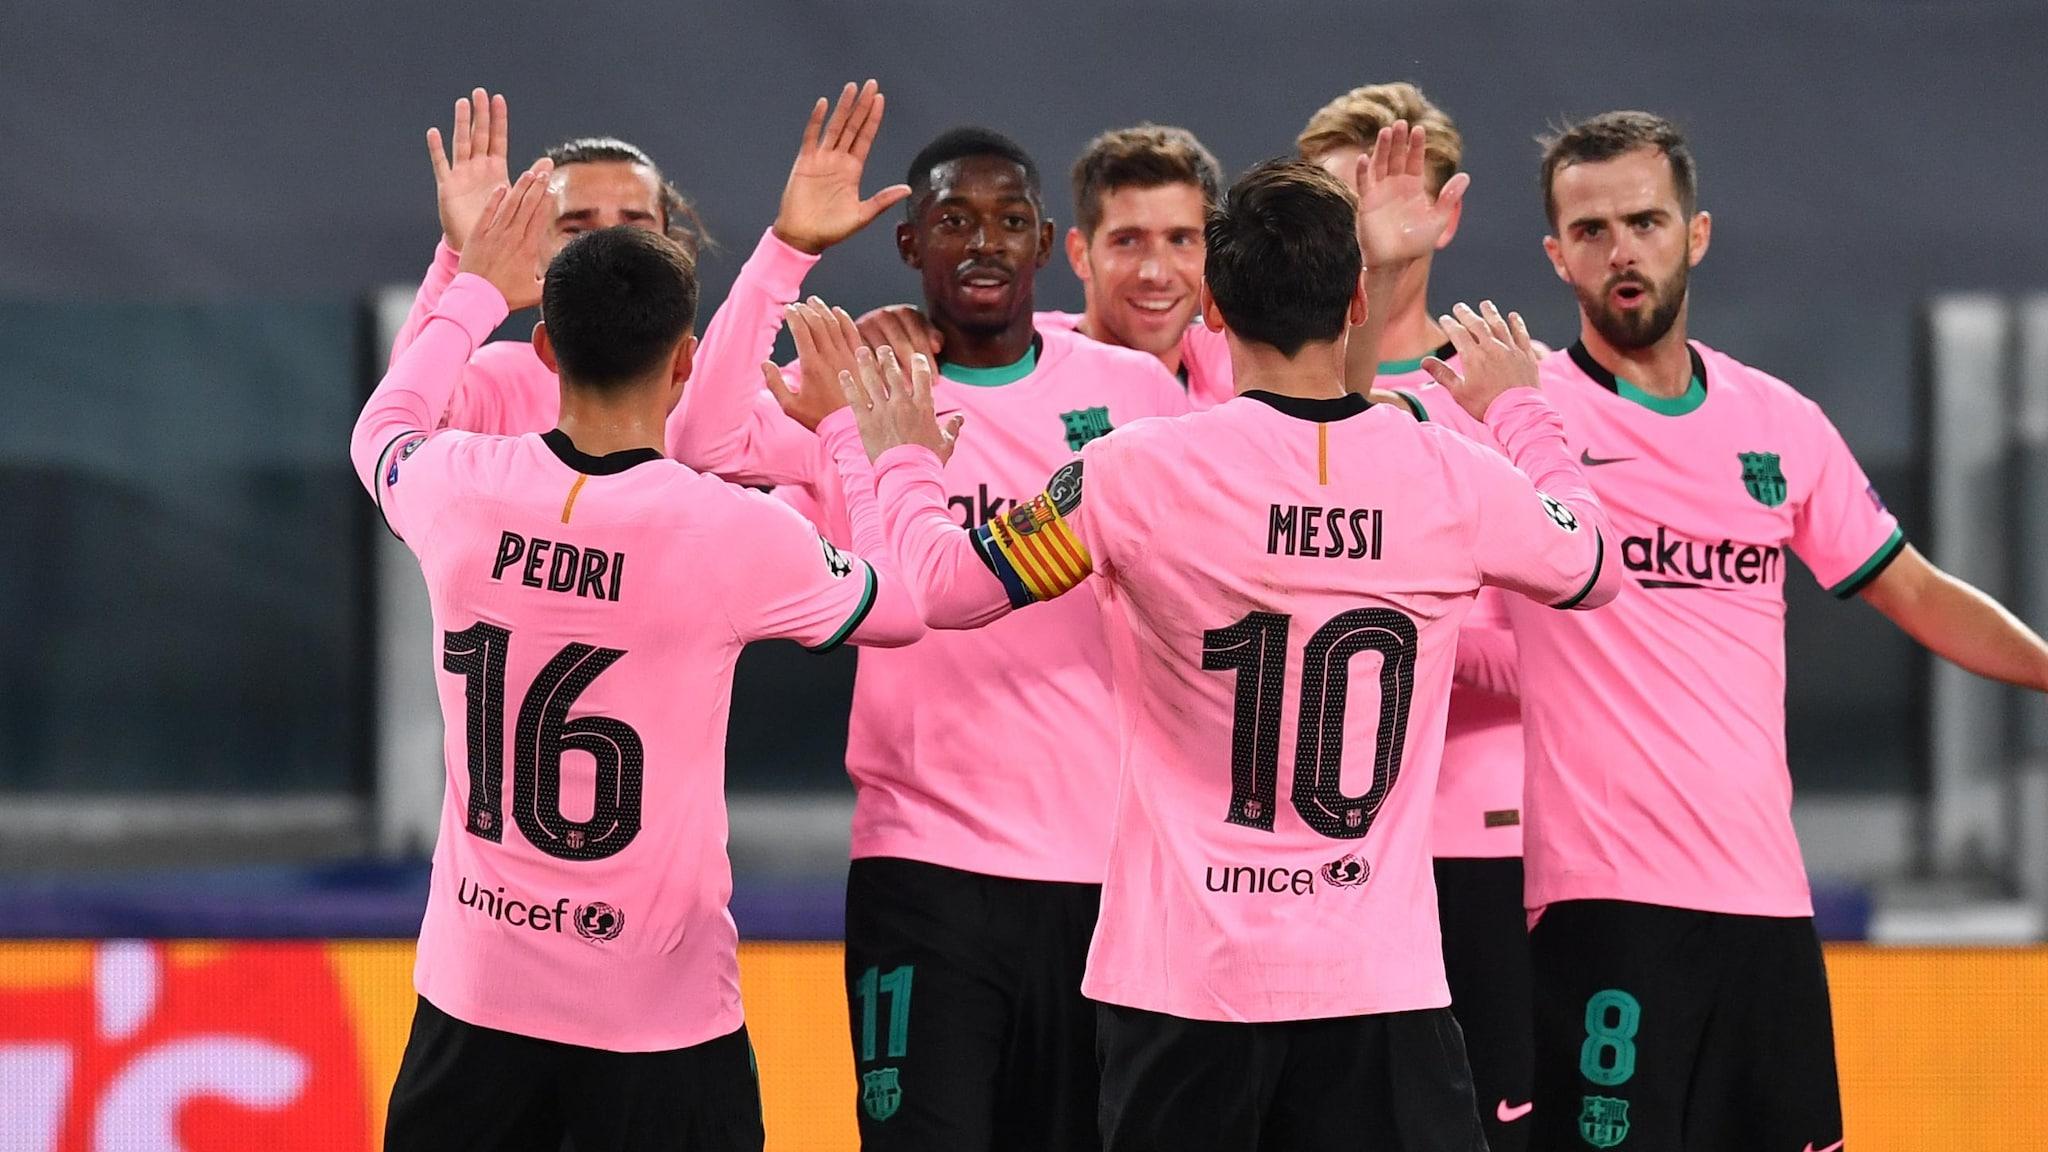 barcelona barcelona juve'yi yendi, rashford united'a ilham verdi